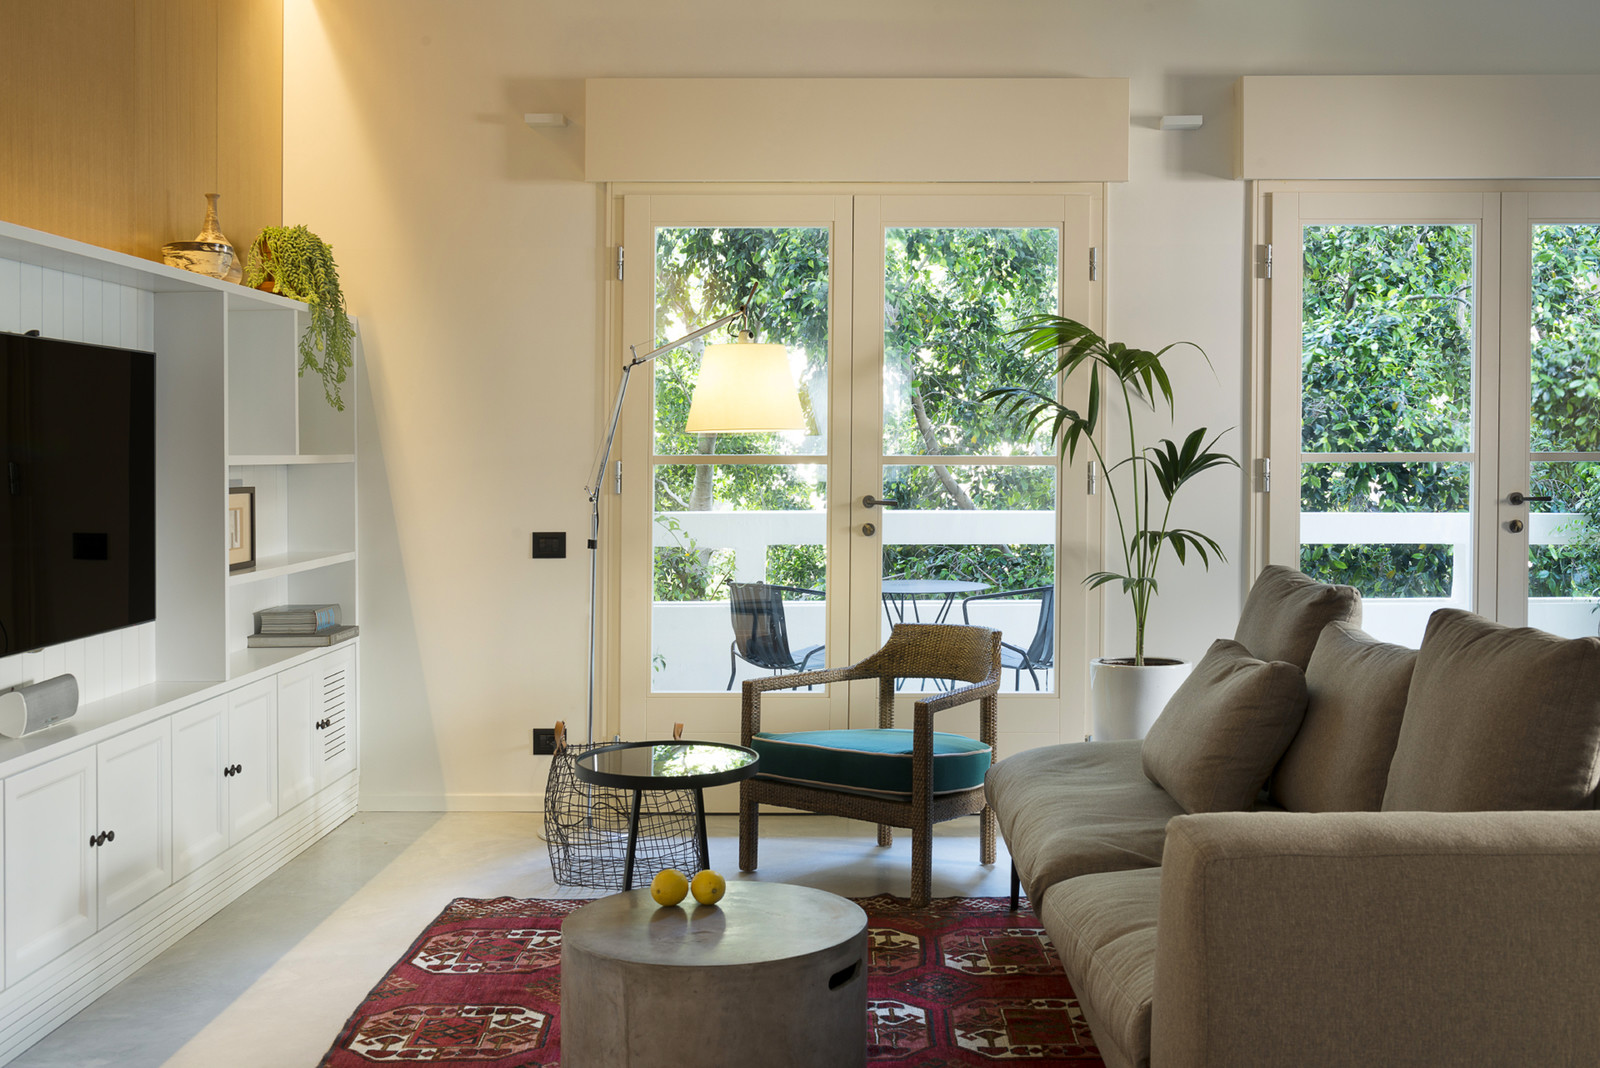 Apartment-renovation-just3ds.com-6